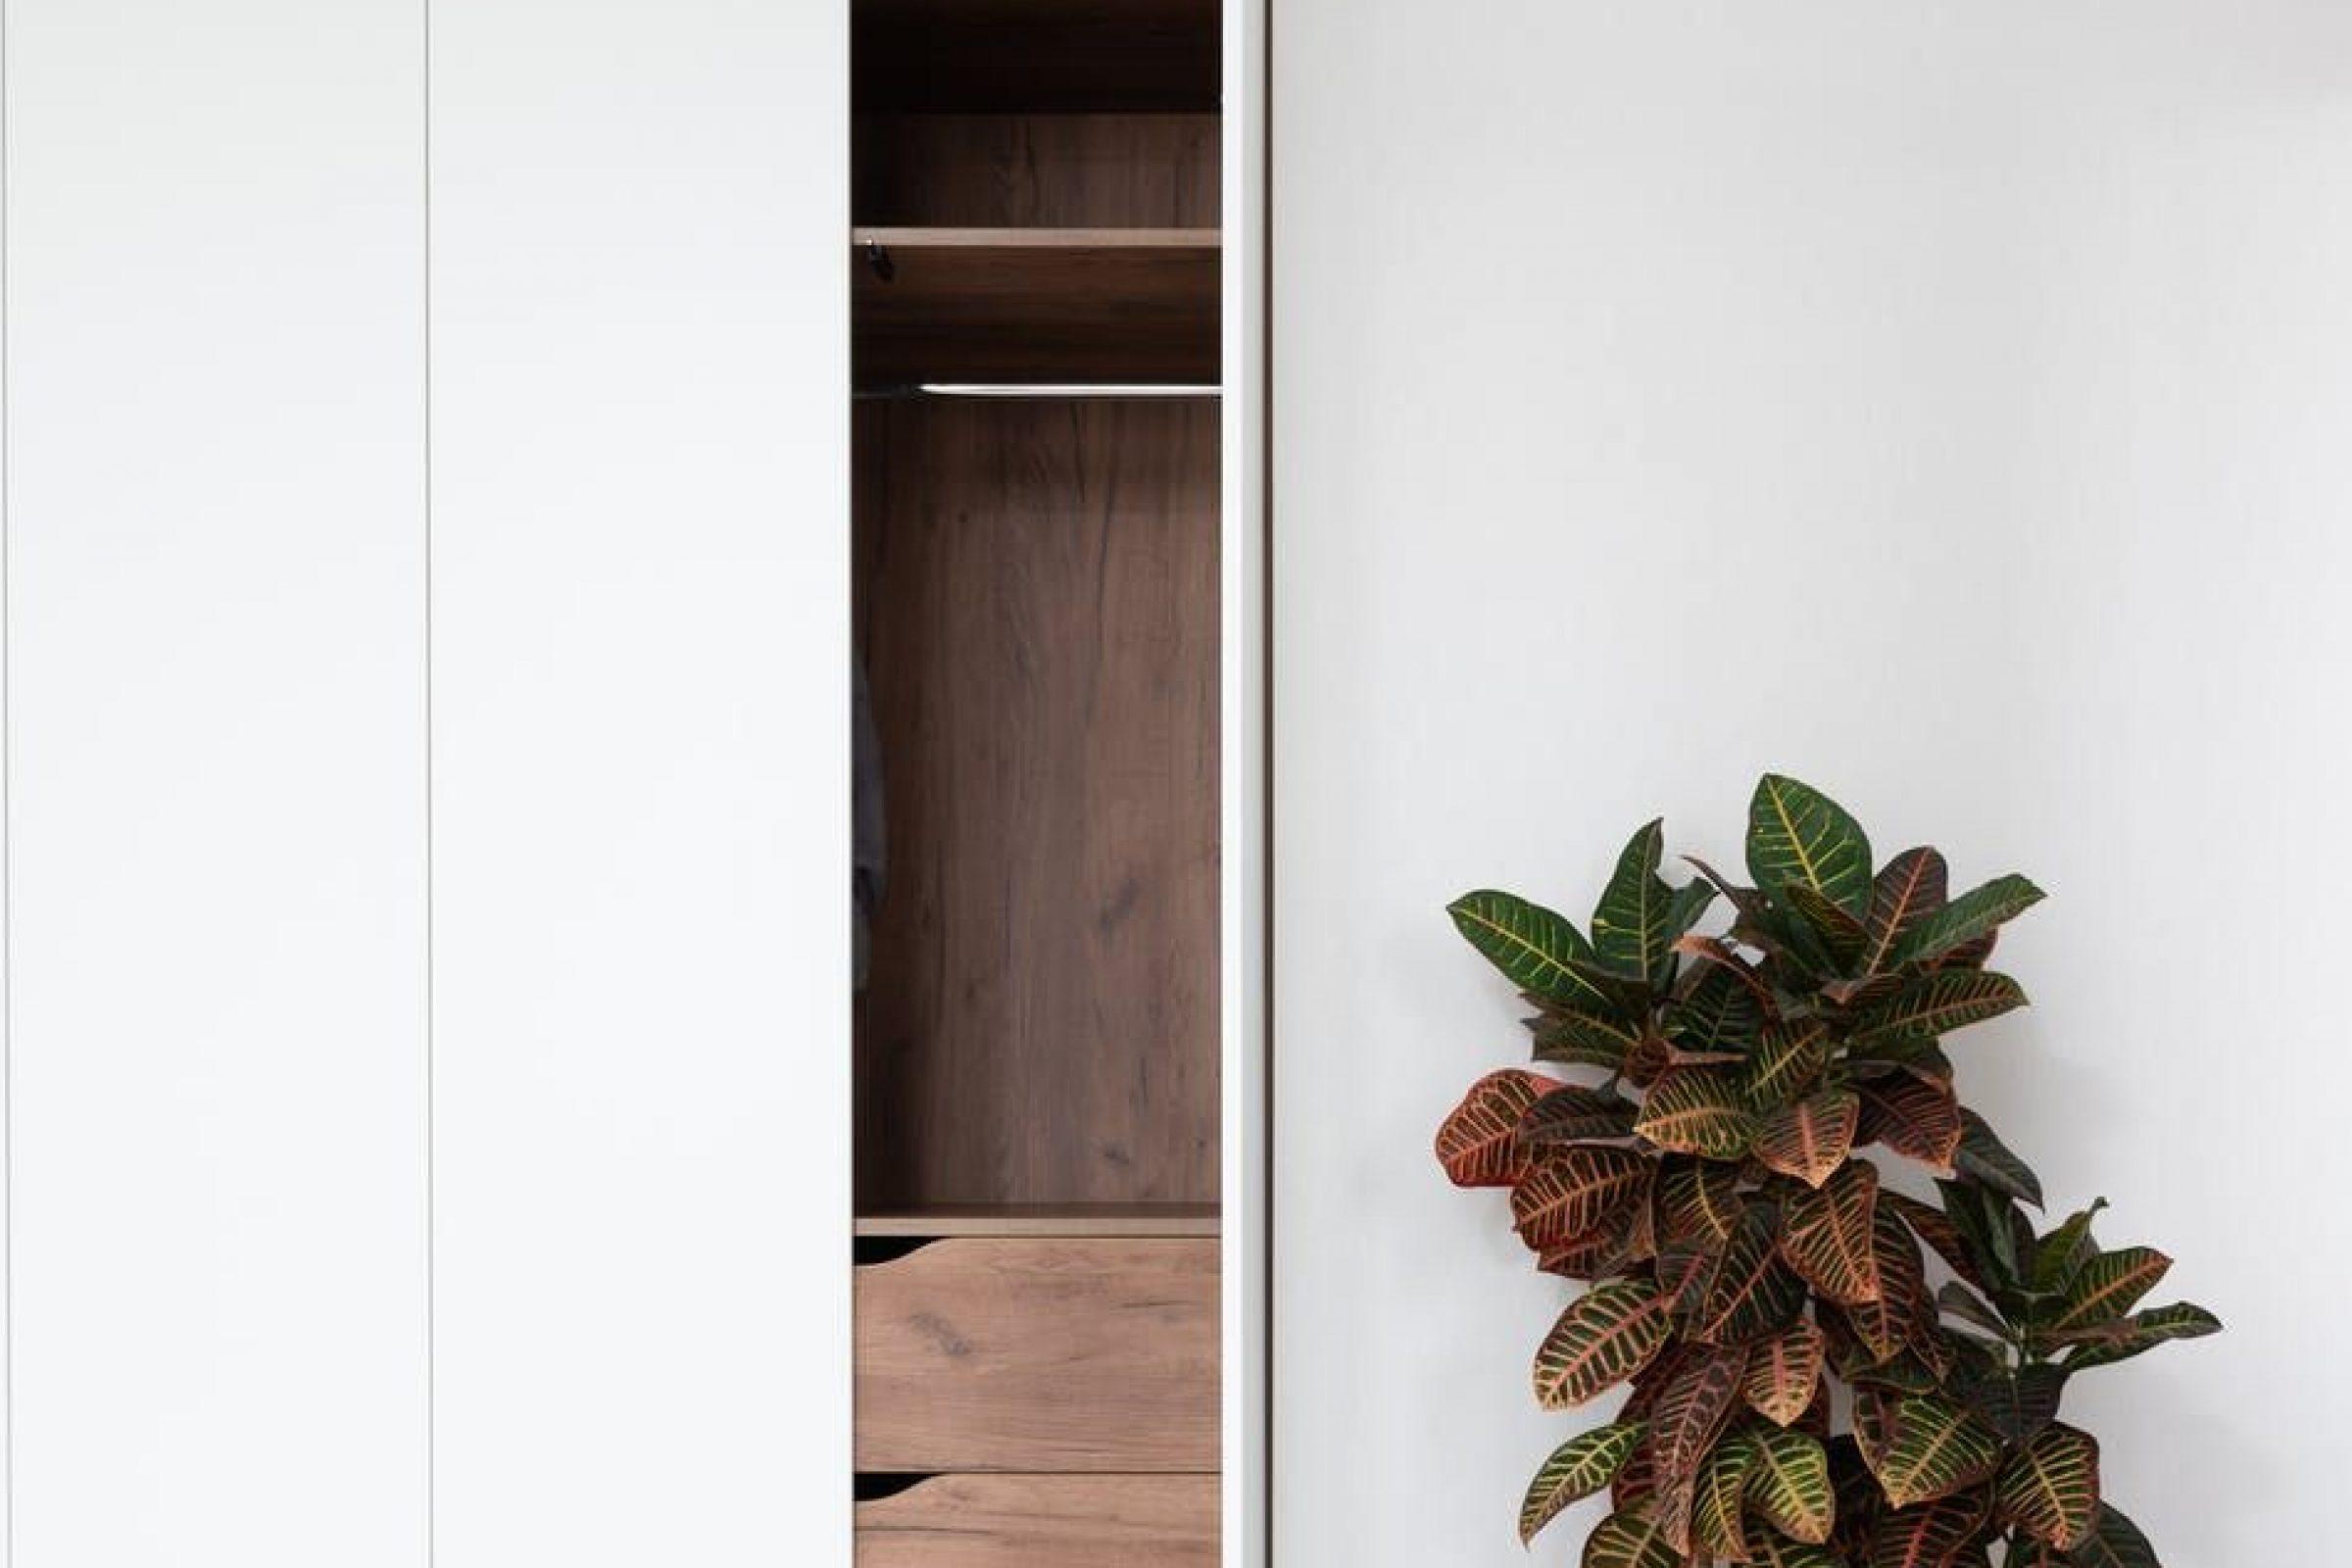 10 Most Unique Bedroom Design Ideas For Low Space Arch2o Com